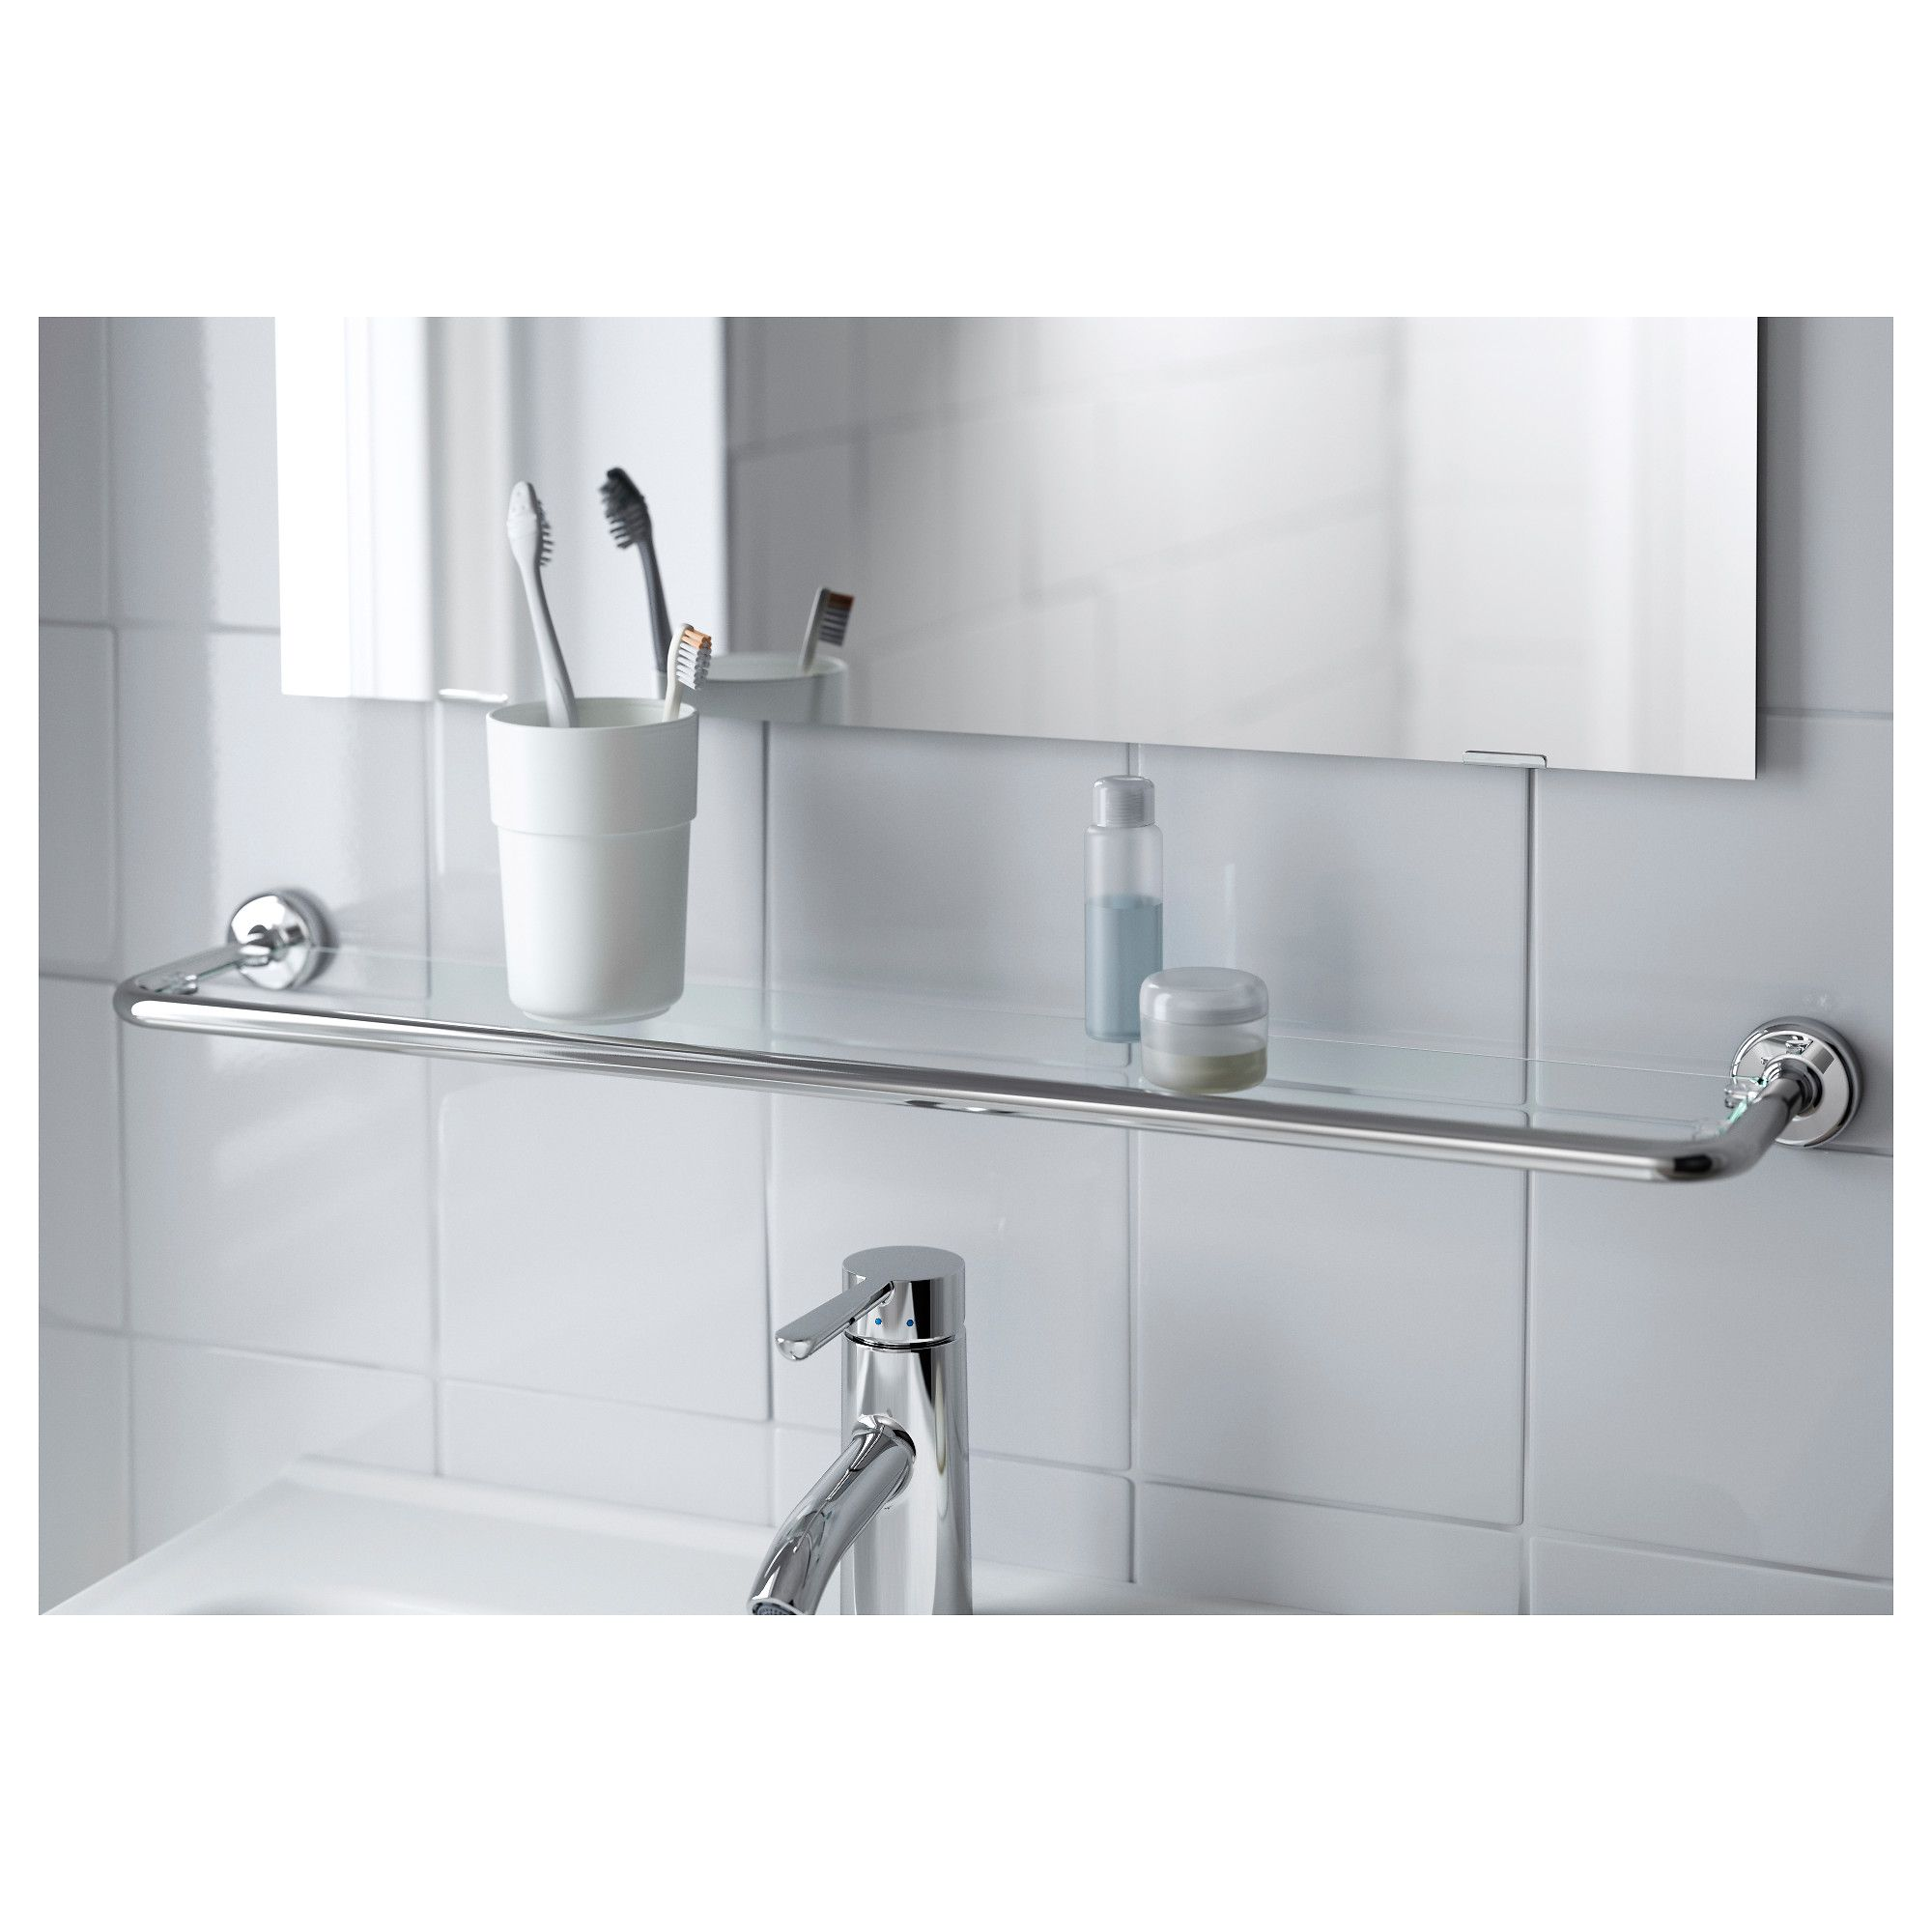 IKEA VOXNAN Glass shelf chrome effect Glass bathroom